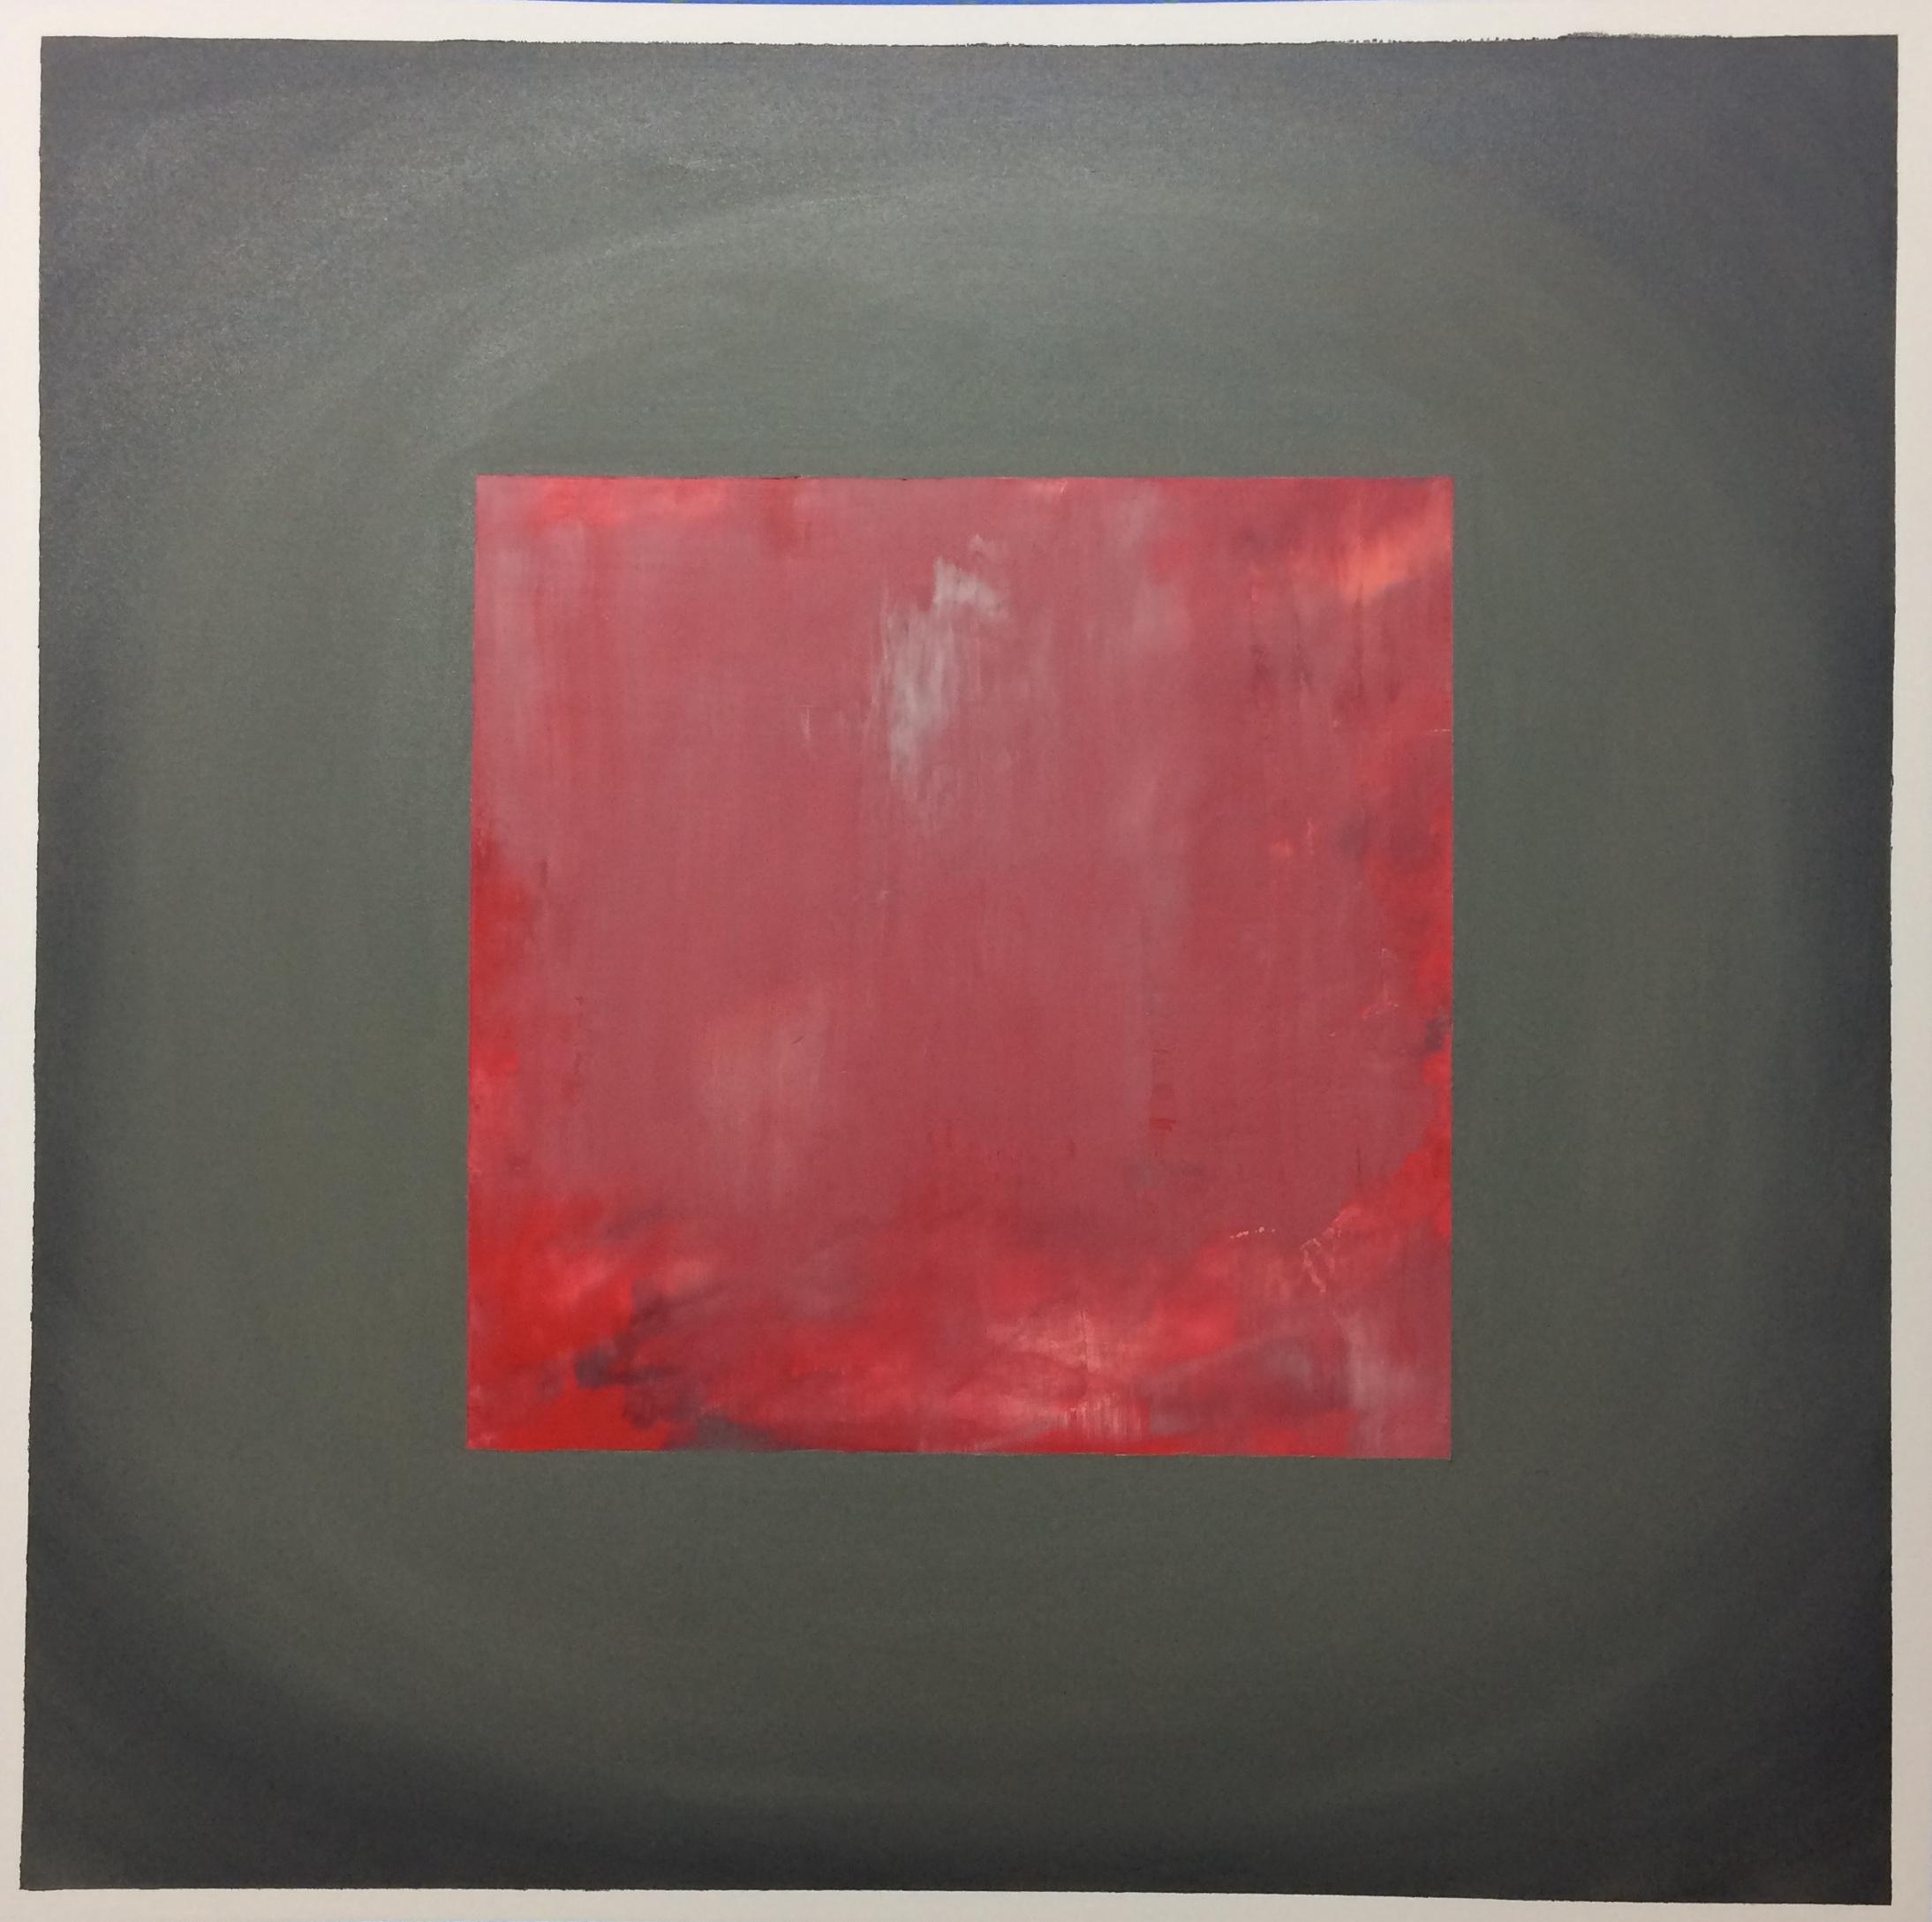 Primary - Reds